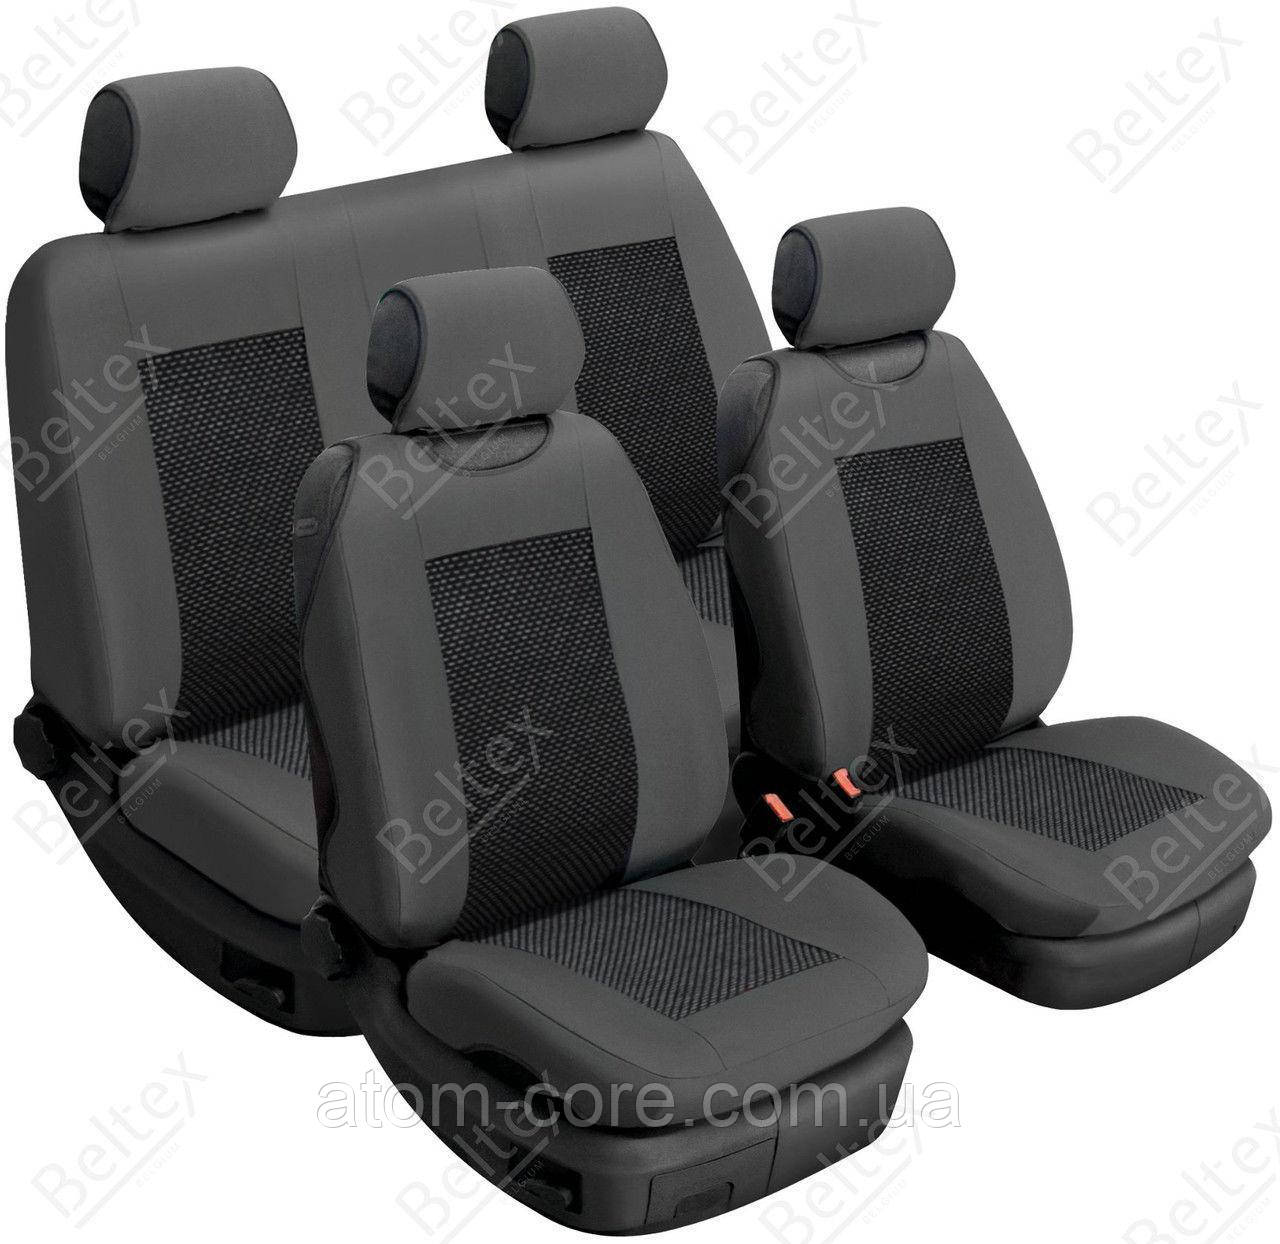 Майки/чехлы на сиденья Шевроле Лачетти (Chevrolet Lacetti)